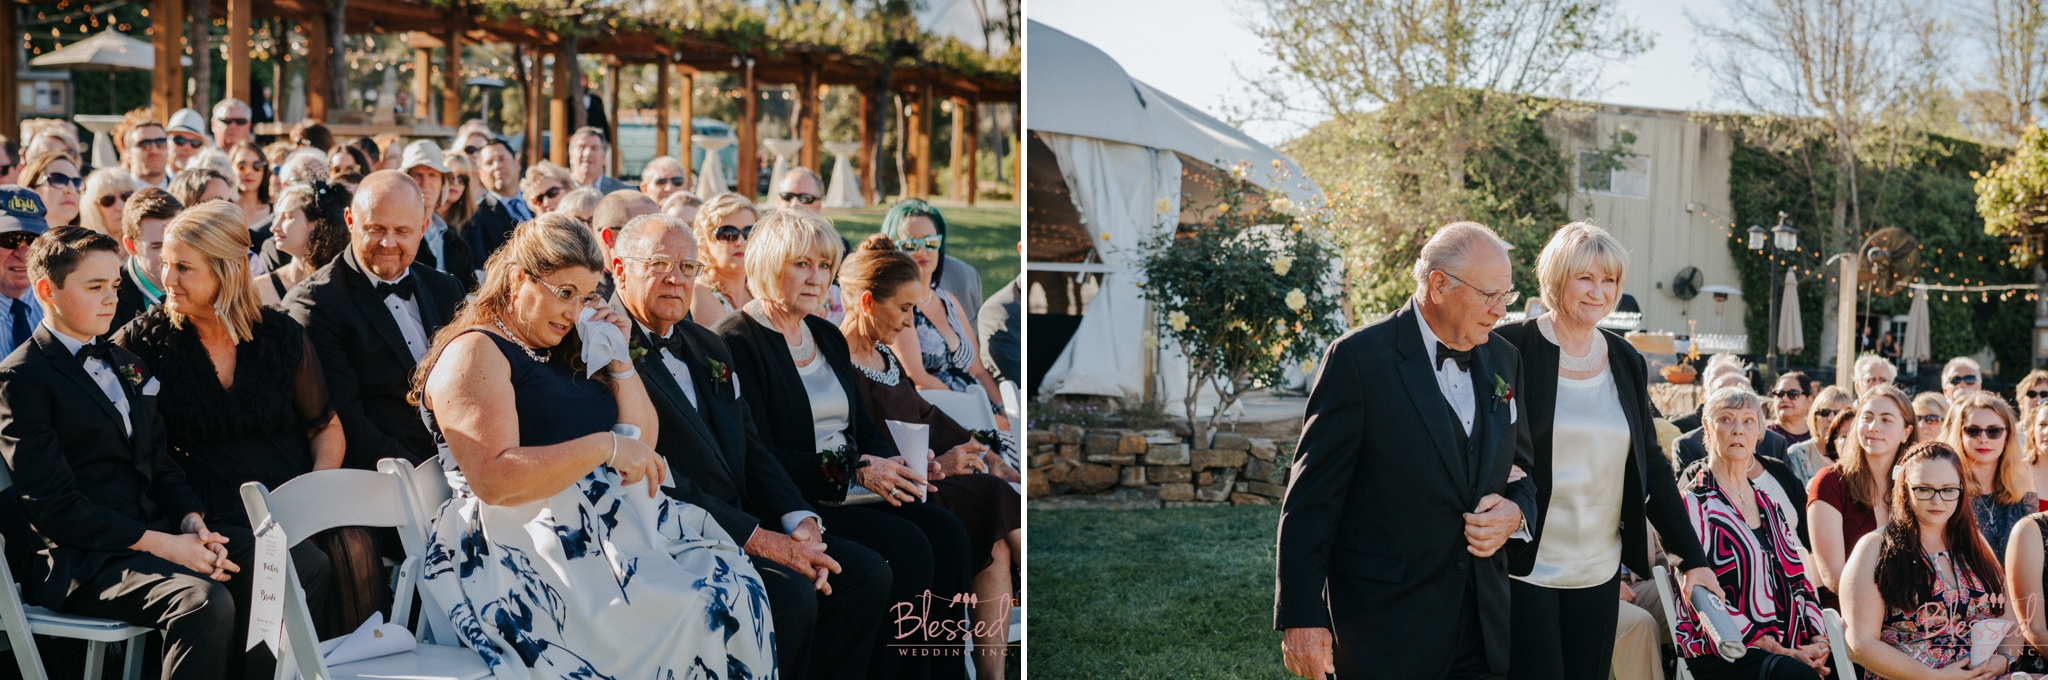 Orfila Vinery Wedding Temecula Wedding Photographer 12.jpg